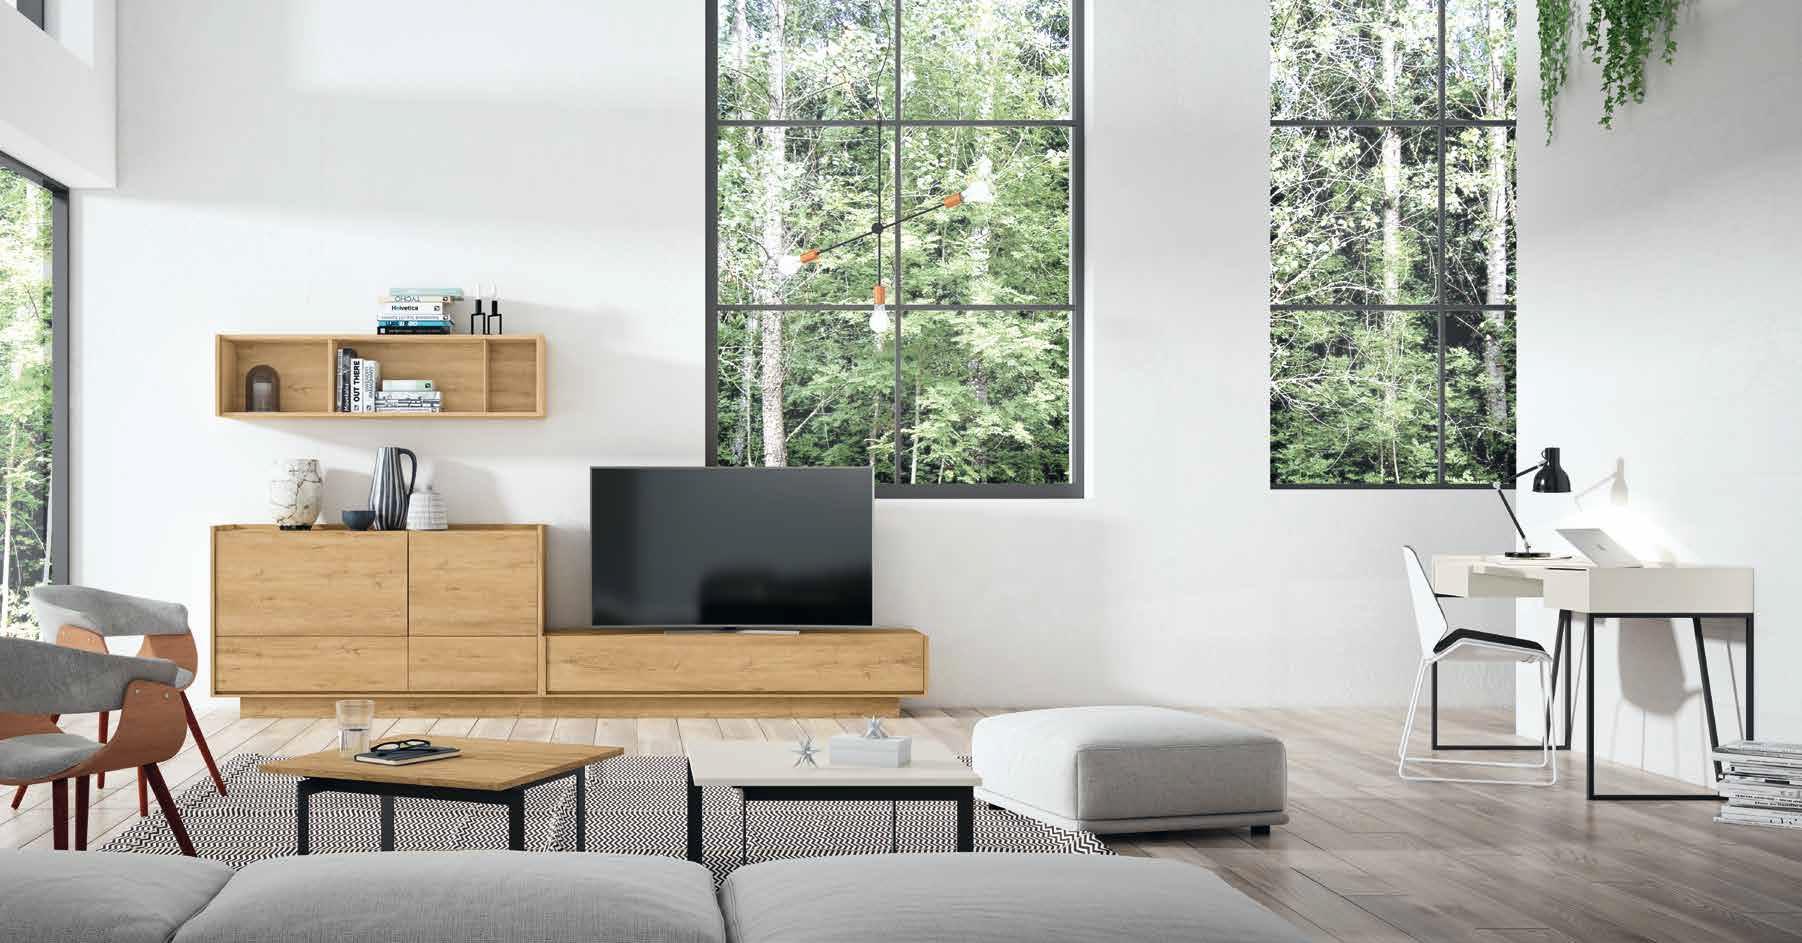 salon-moderno-Nativ-2019-muebles-paco-caballero-0920-5c8cea9f48731